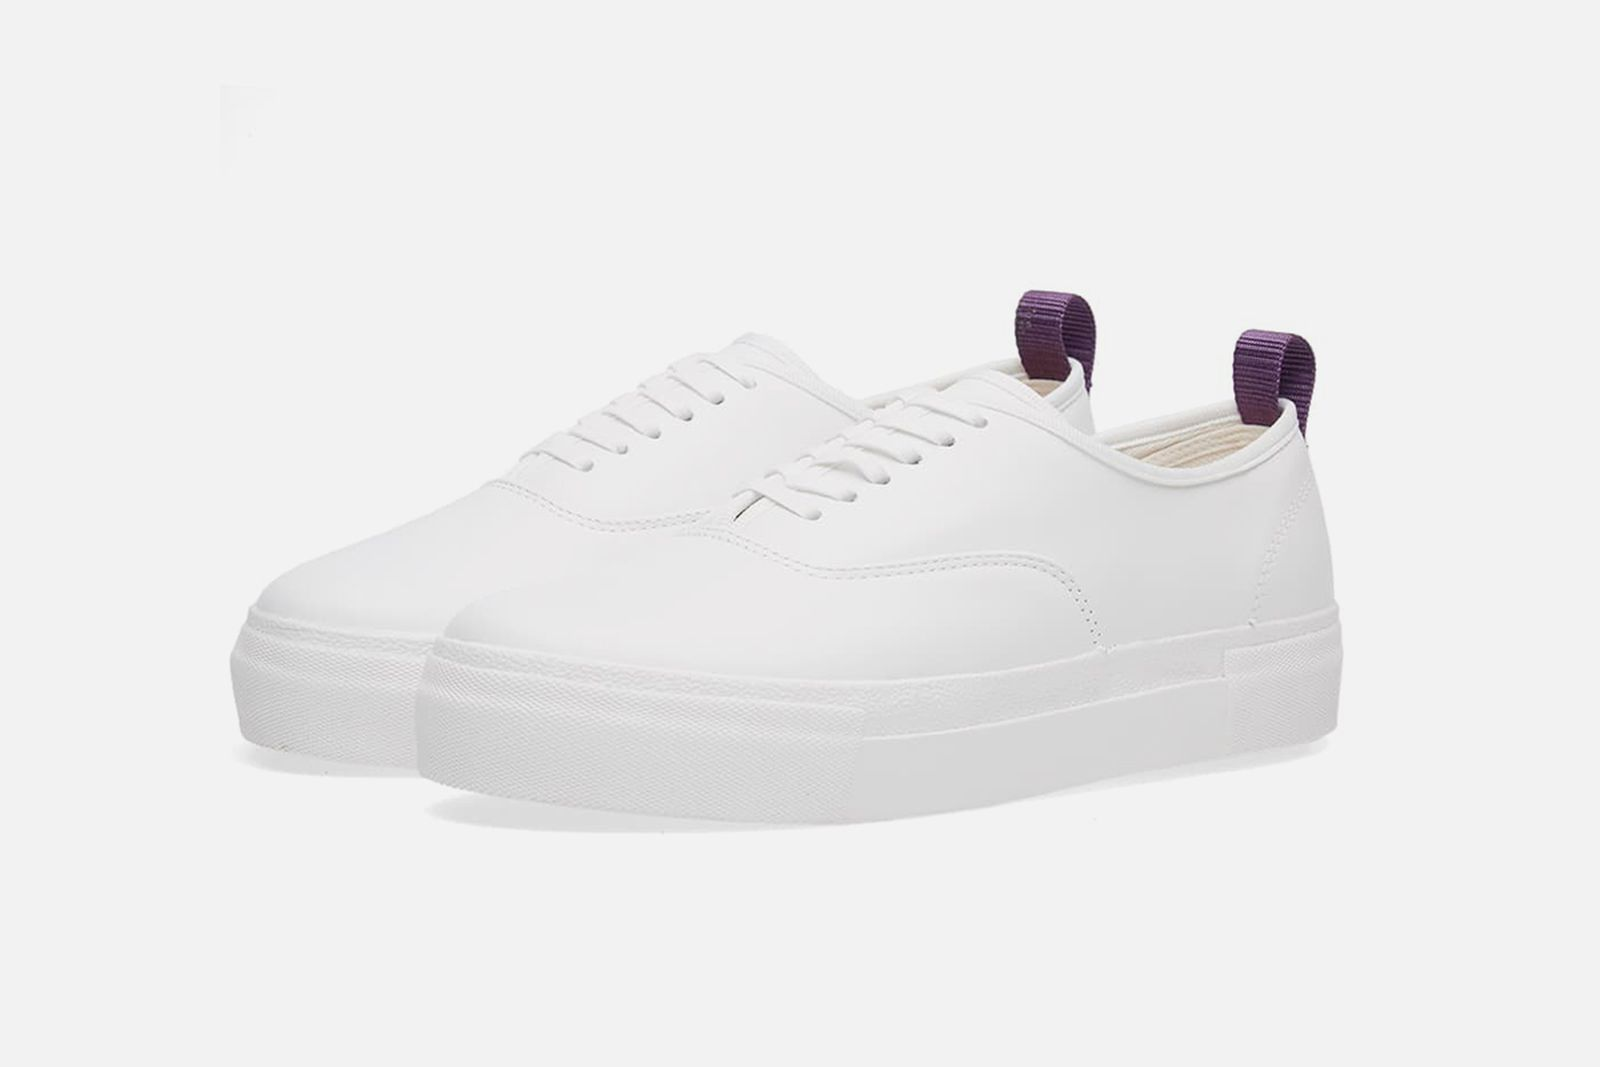 20 02 2017 eytys motherleathersneaker white et mlt wh sh 1 Margiela Stüssy end